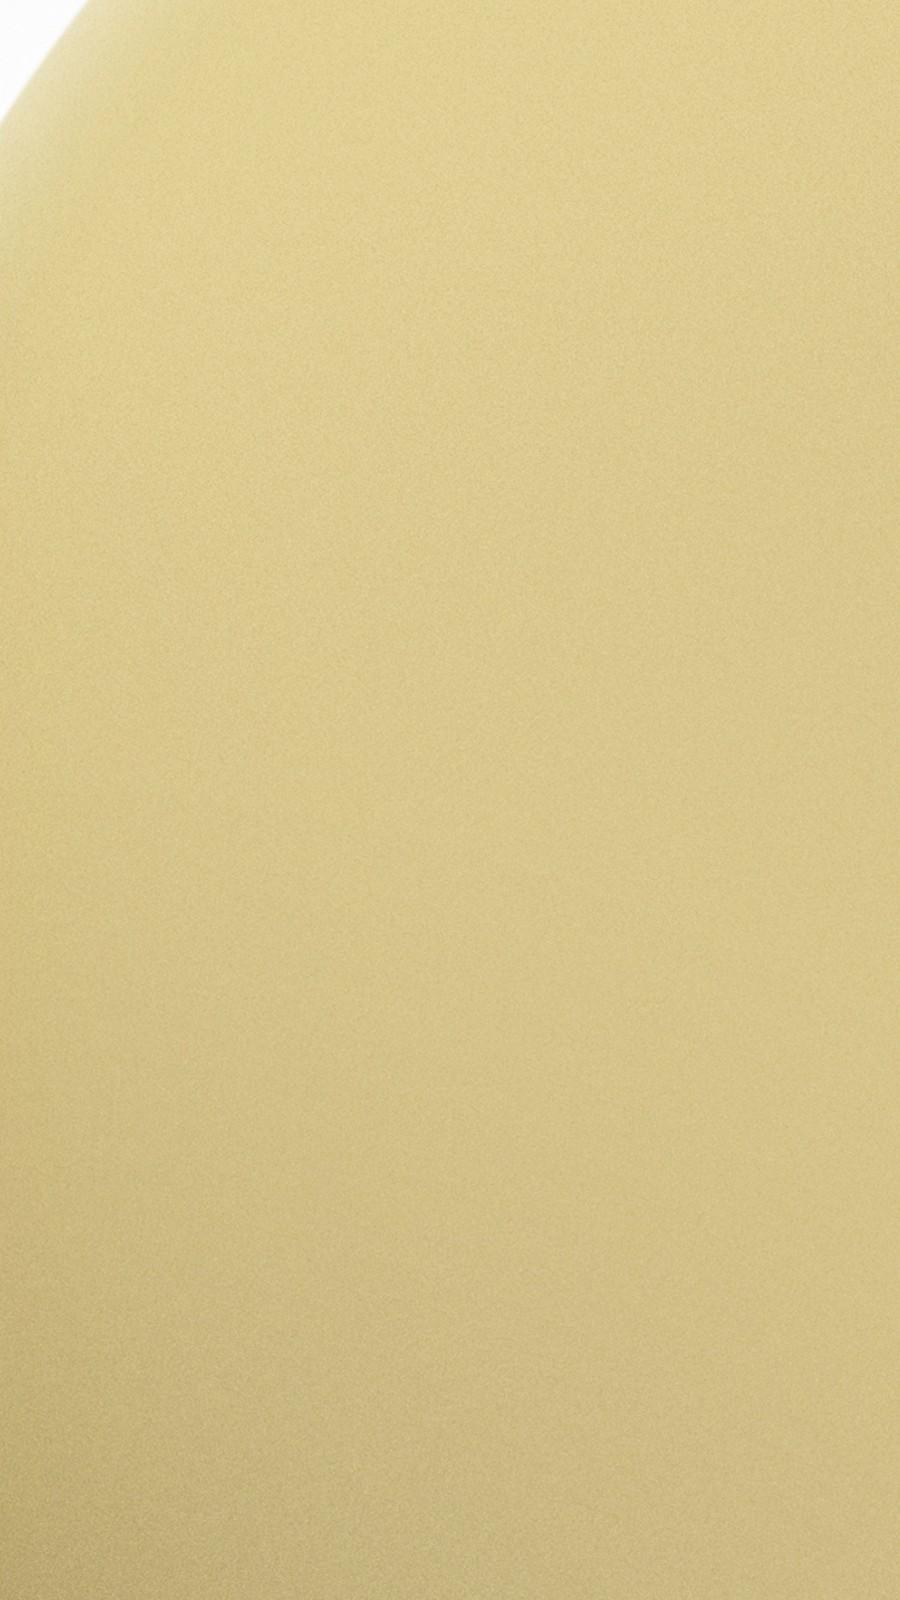 Pale yellow 415 Nail Polish - Pale Yellow No.415 - Image 2